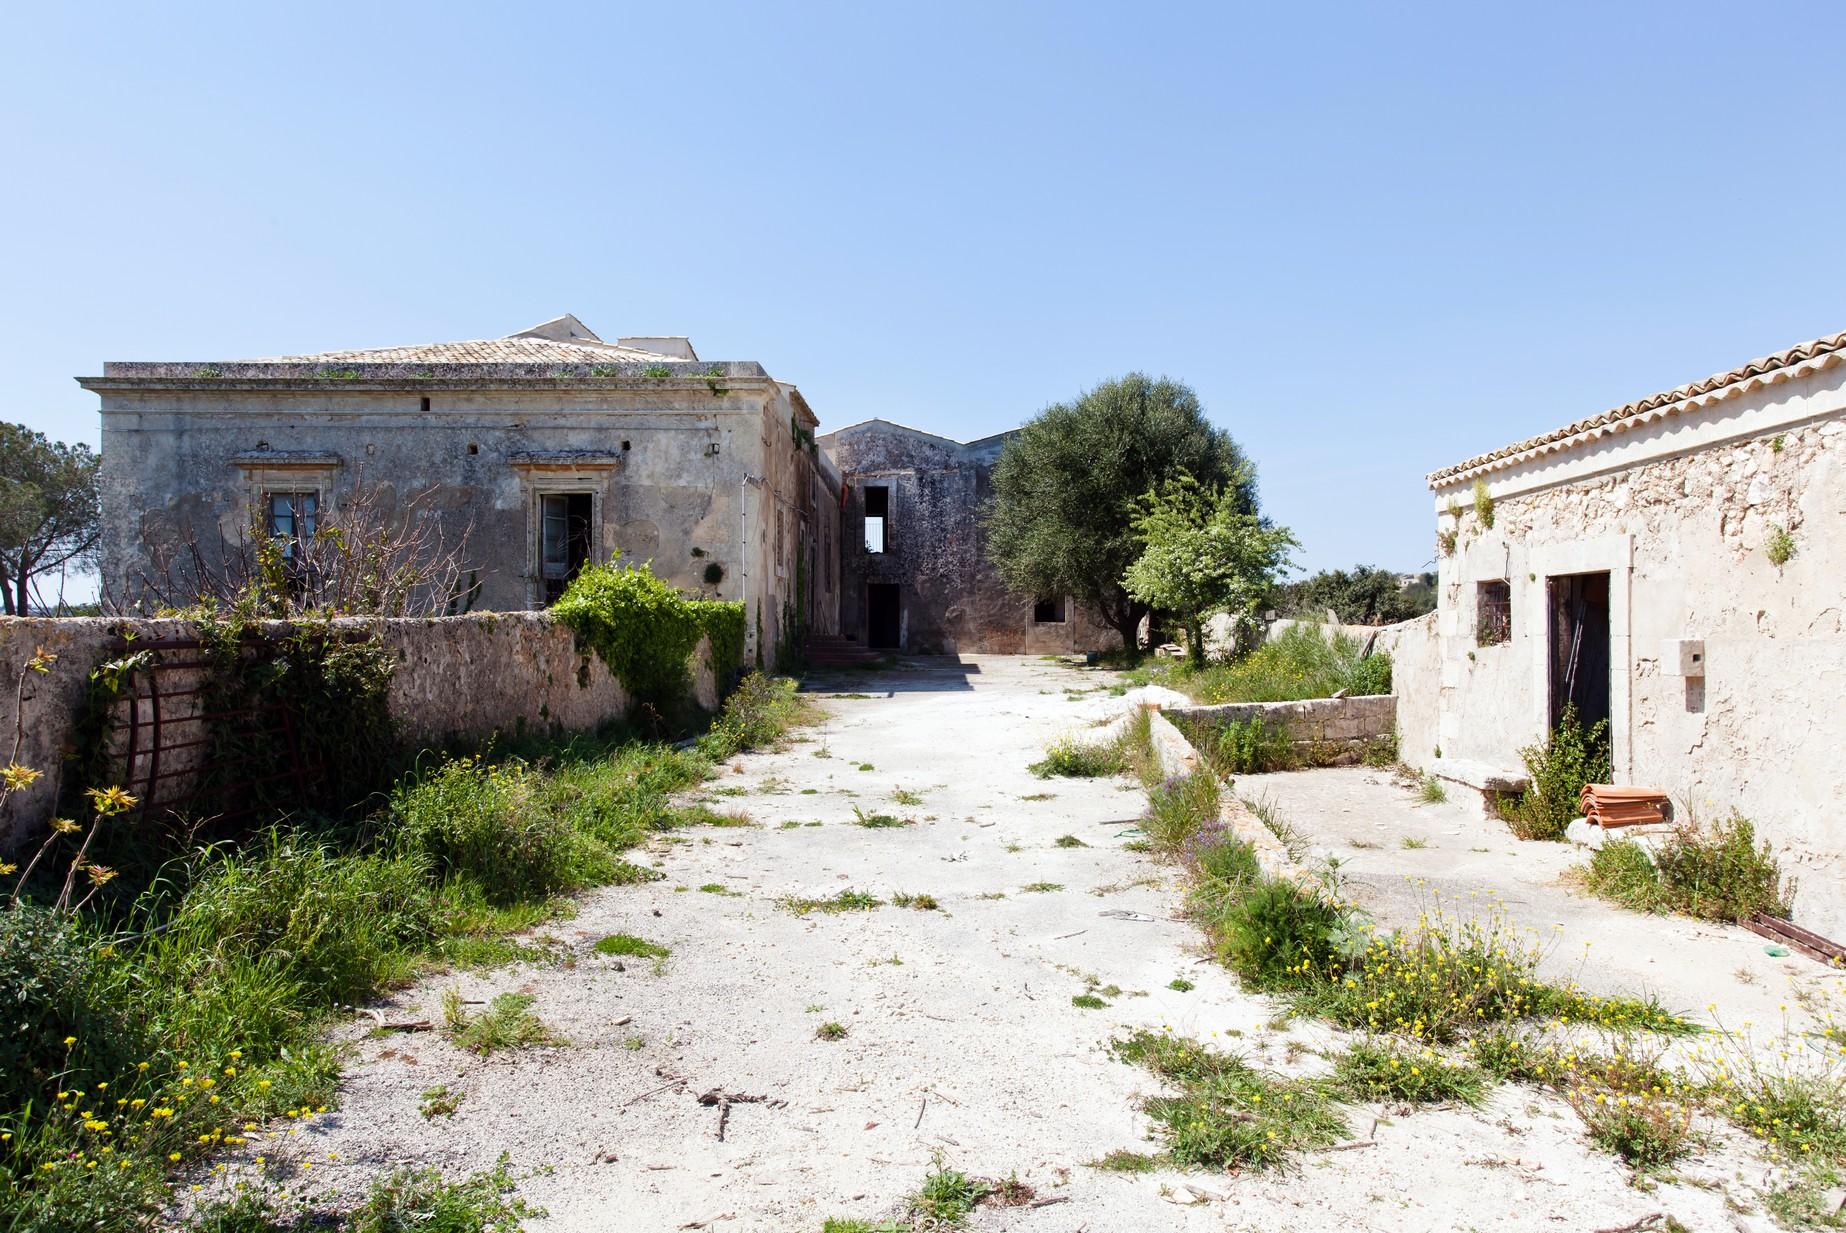 Casa indipendente in Vendita a Noto: 5 locali, 1000 mq - Foto 13